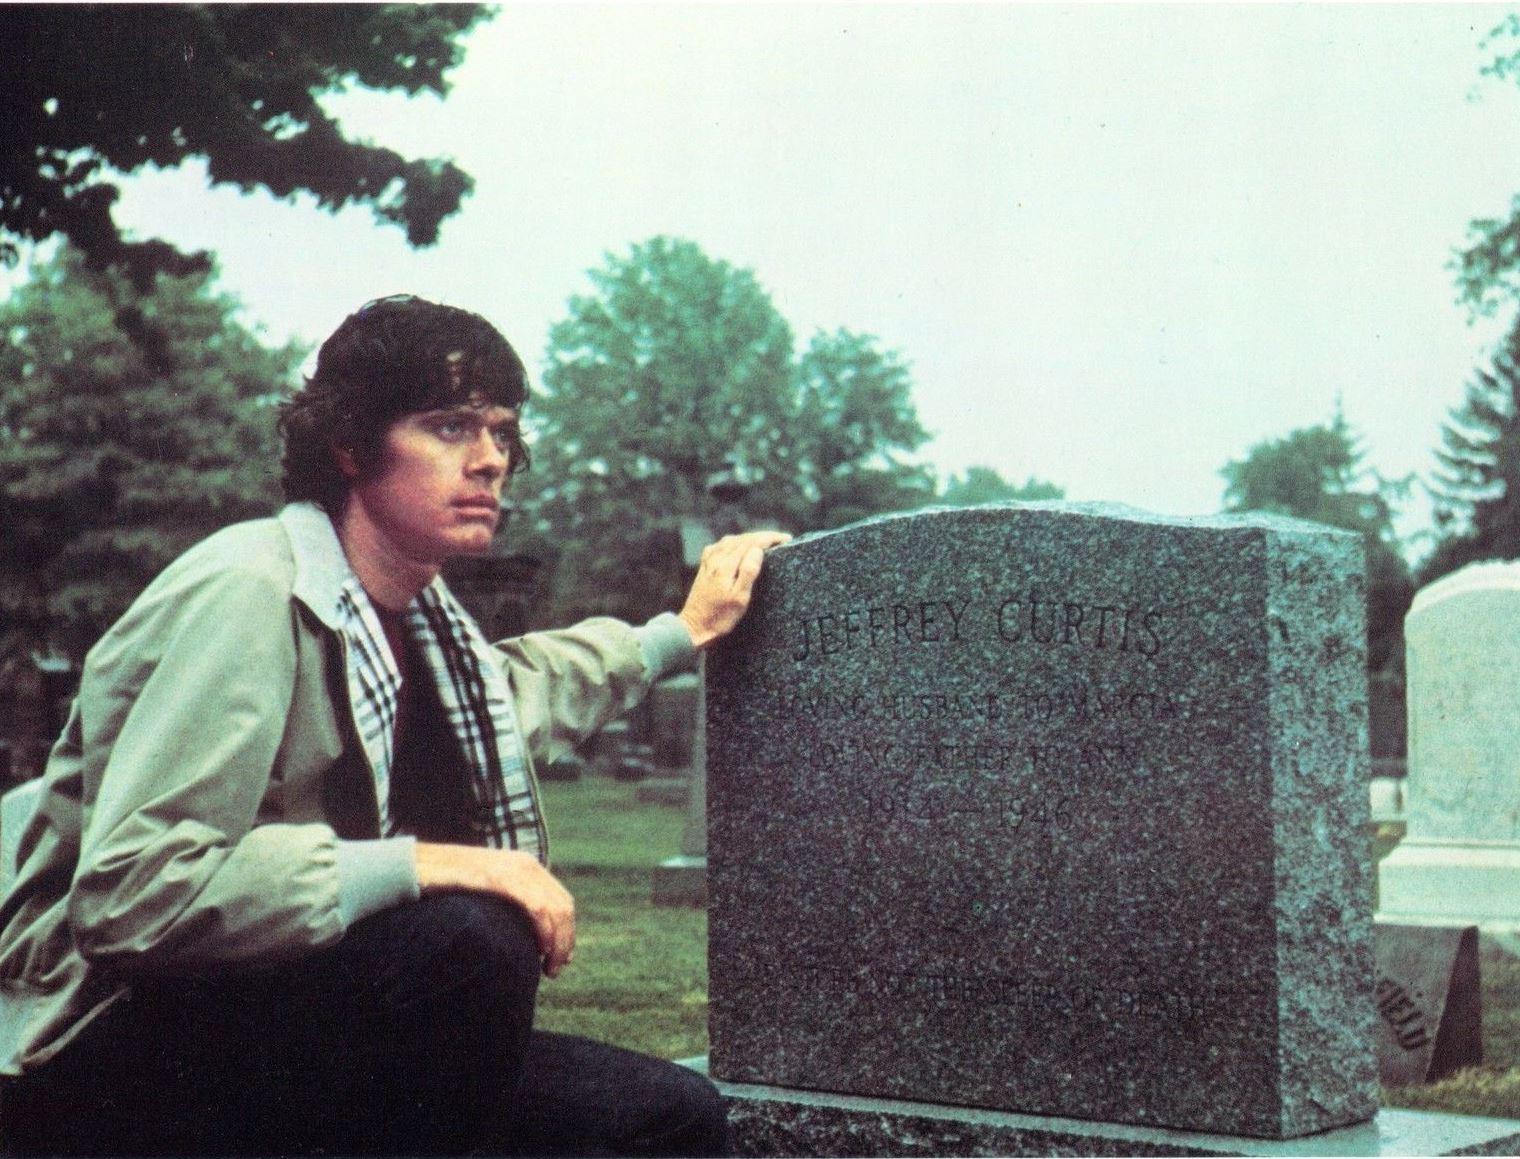 Michael Sarrazin in The Reincarnation of Peter Proud (1975)